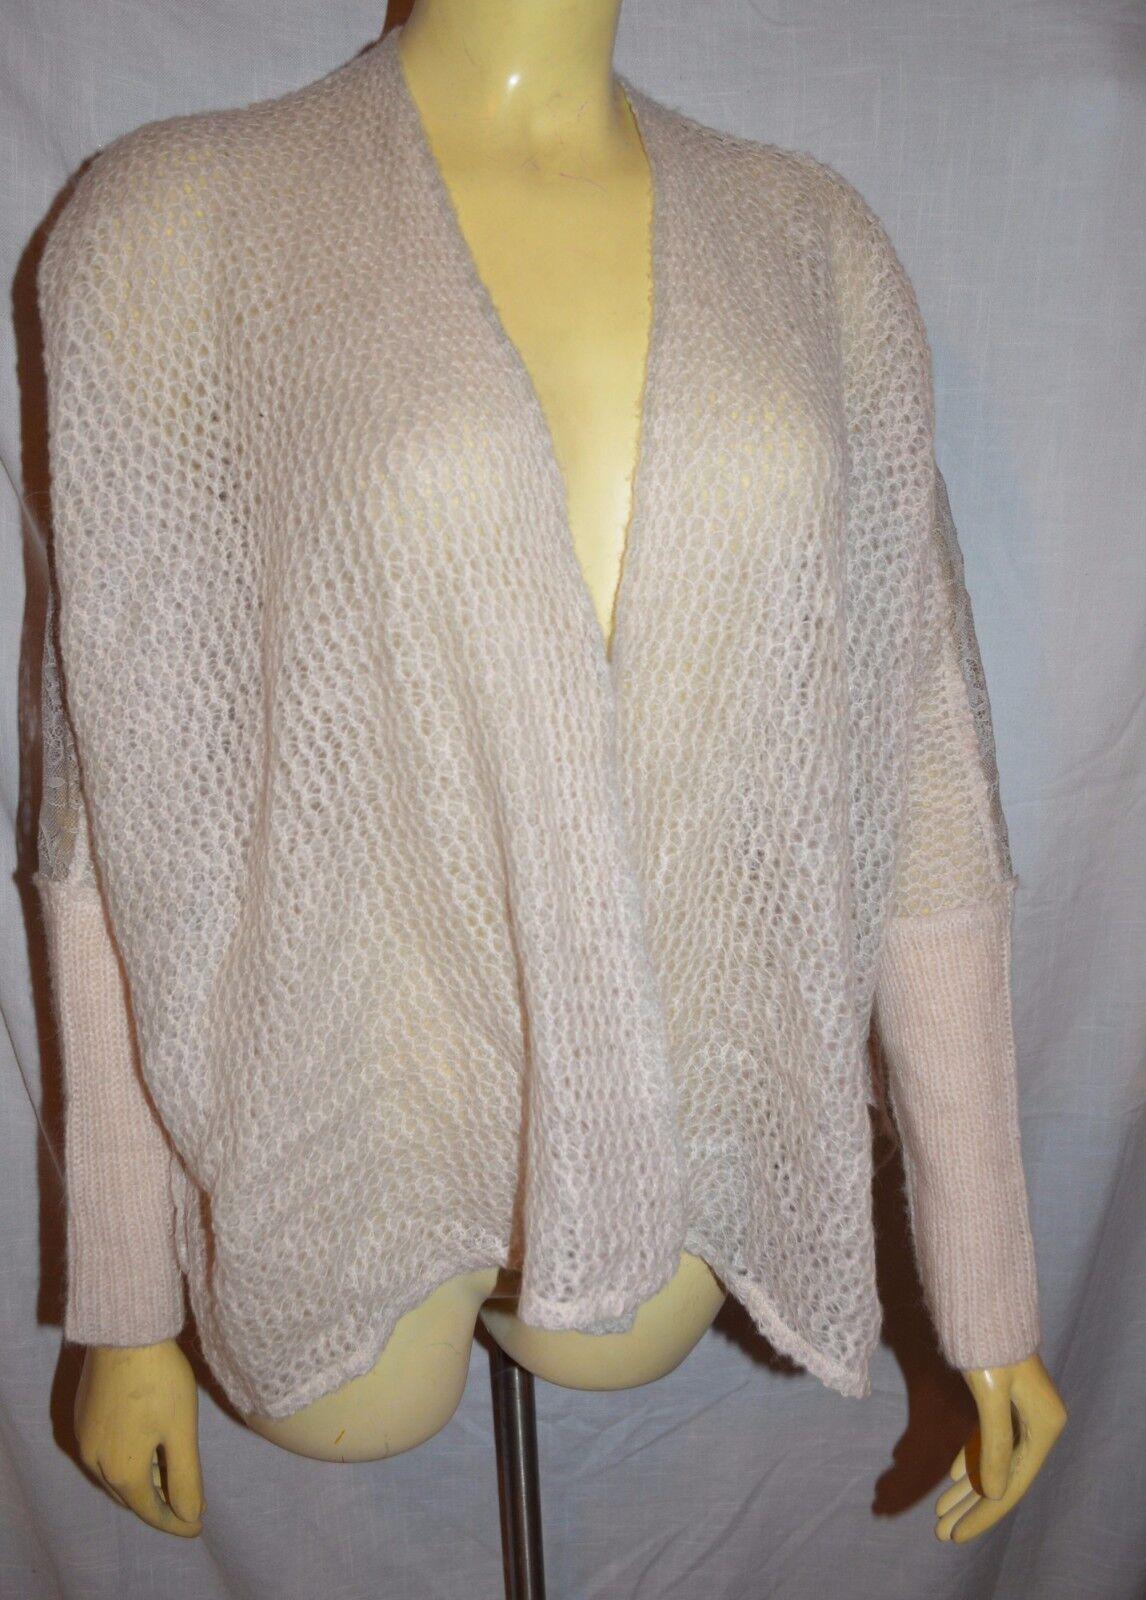 FREE PEOPLE Lace Crocheted Wool Alpaca knit  Cardigan Sweater XS oversized